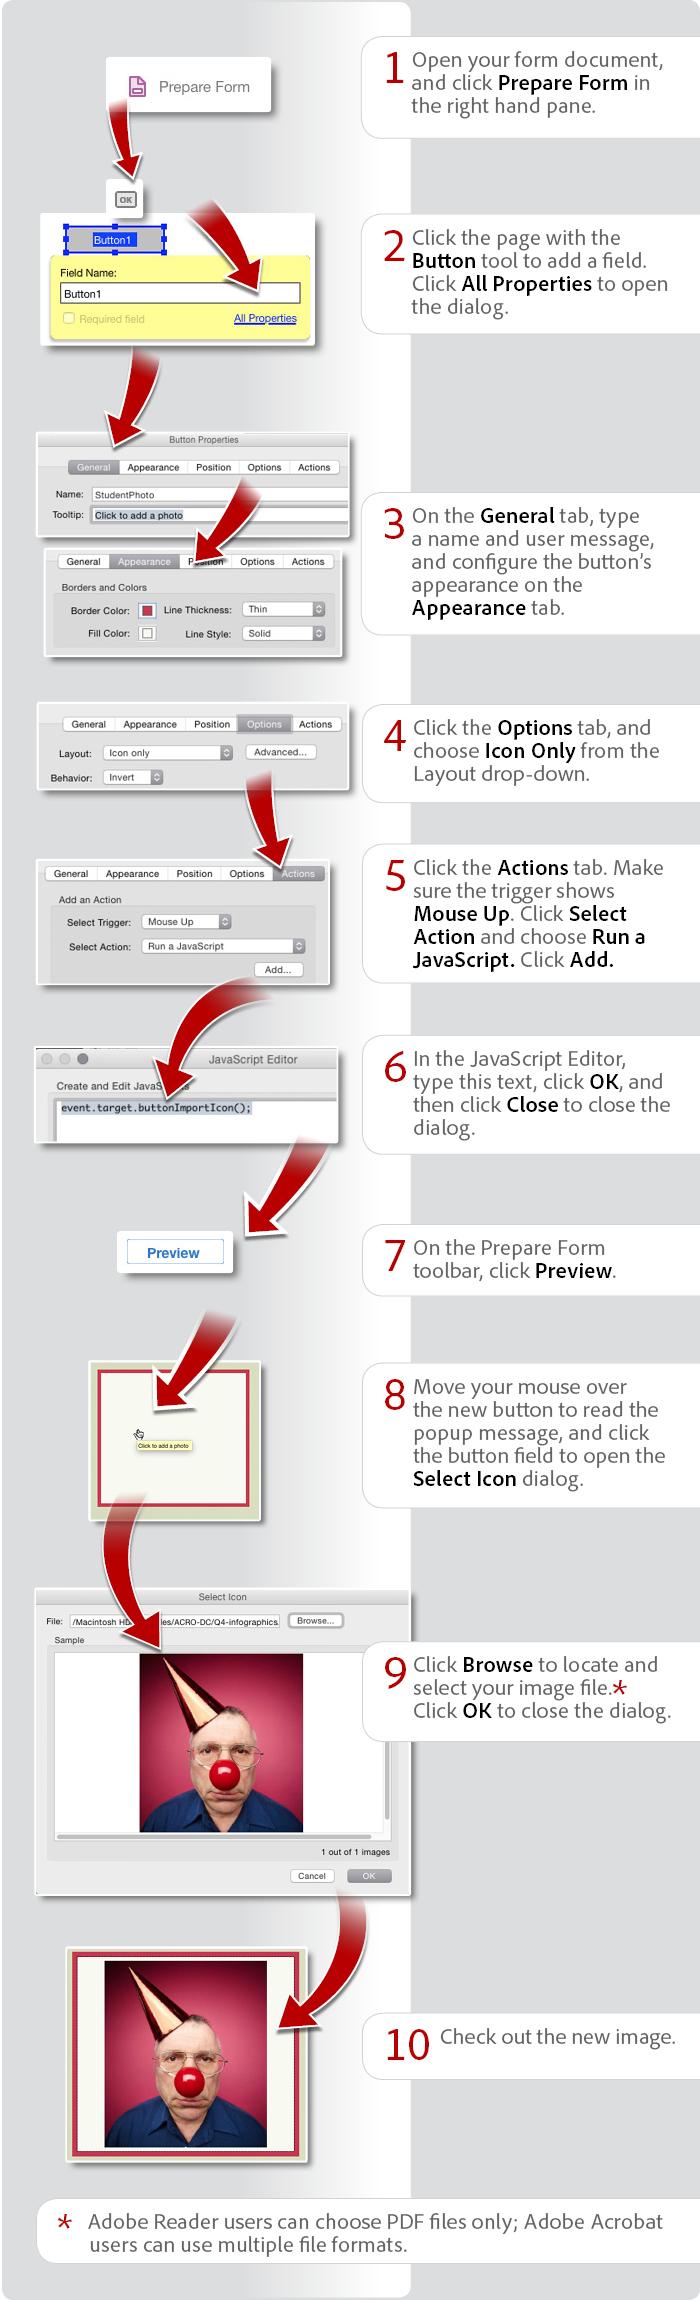 Add a button to a PDF form using Acrobat DC